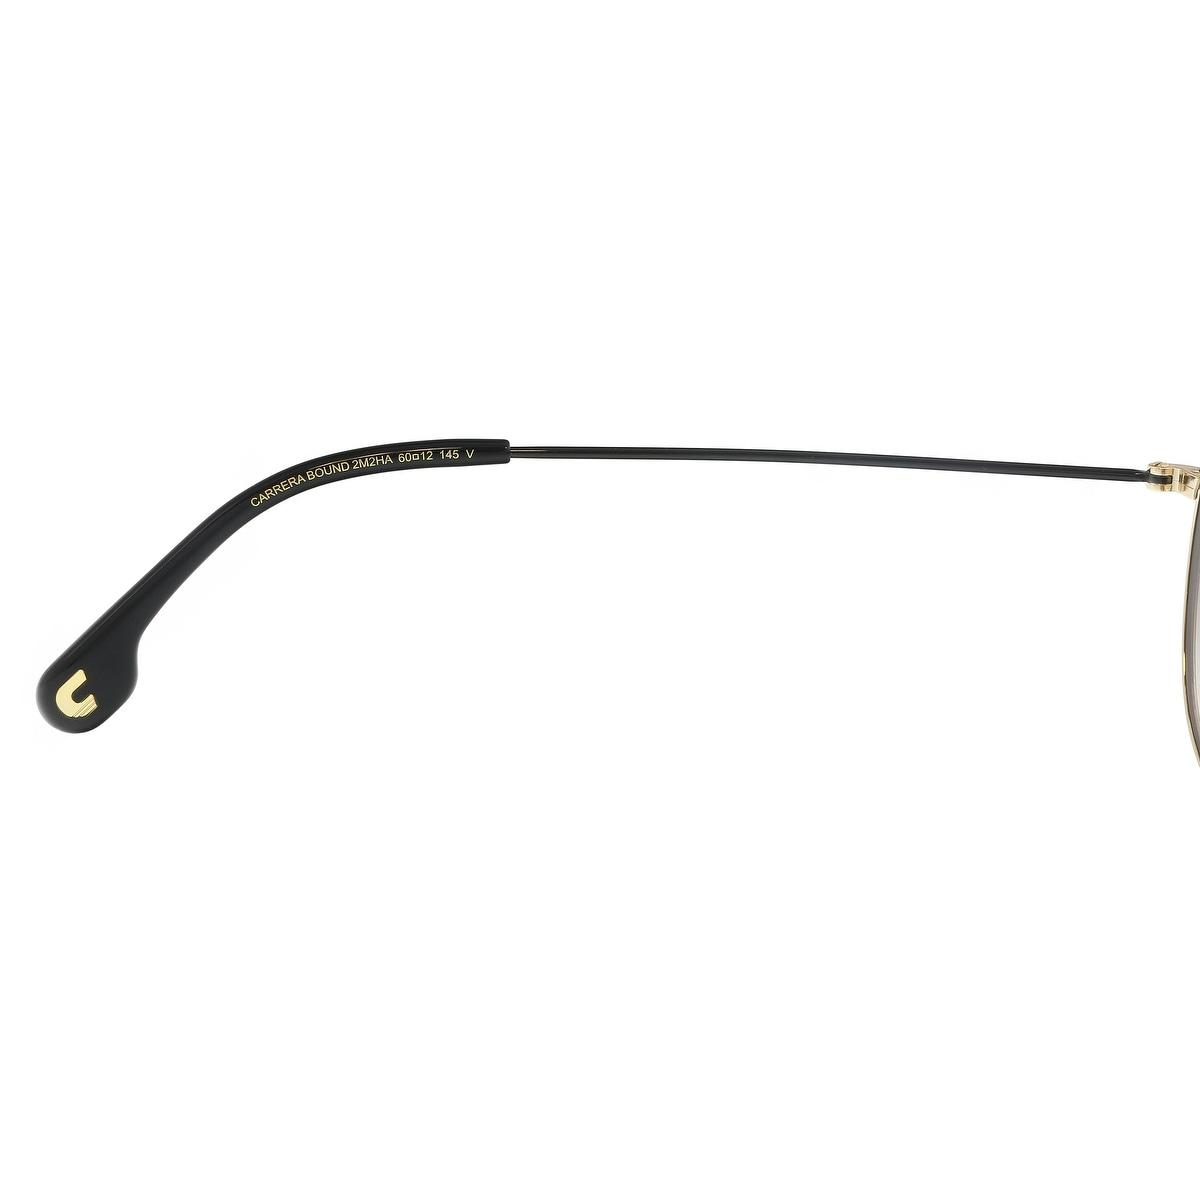 06f4a75c1944 Versace Men S Ve2140 2140 Shield Sunglasses